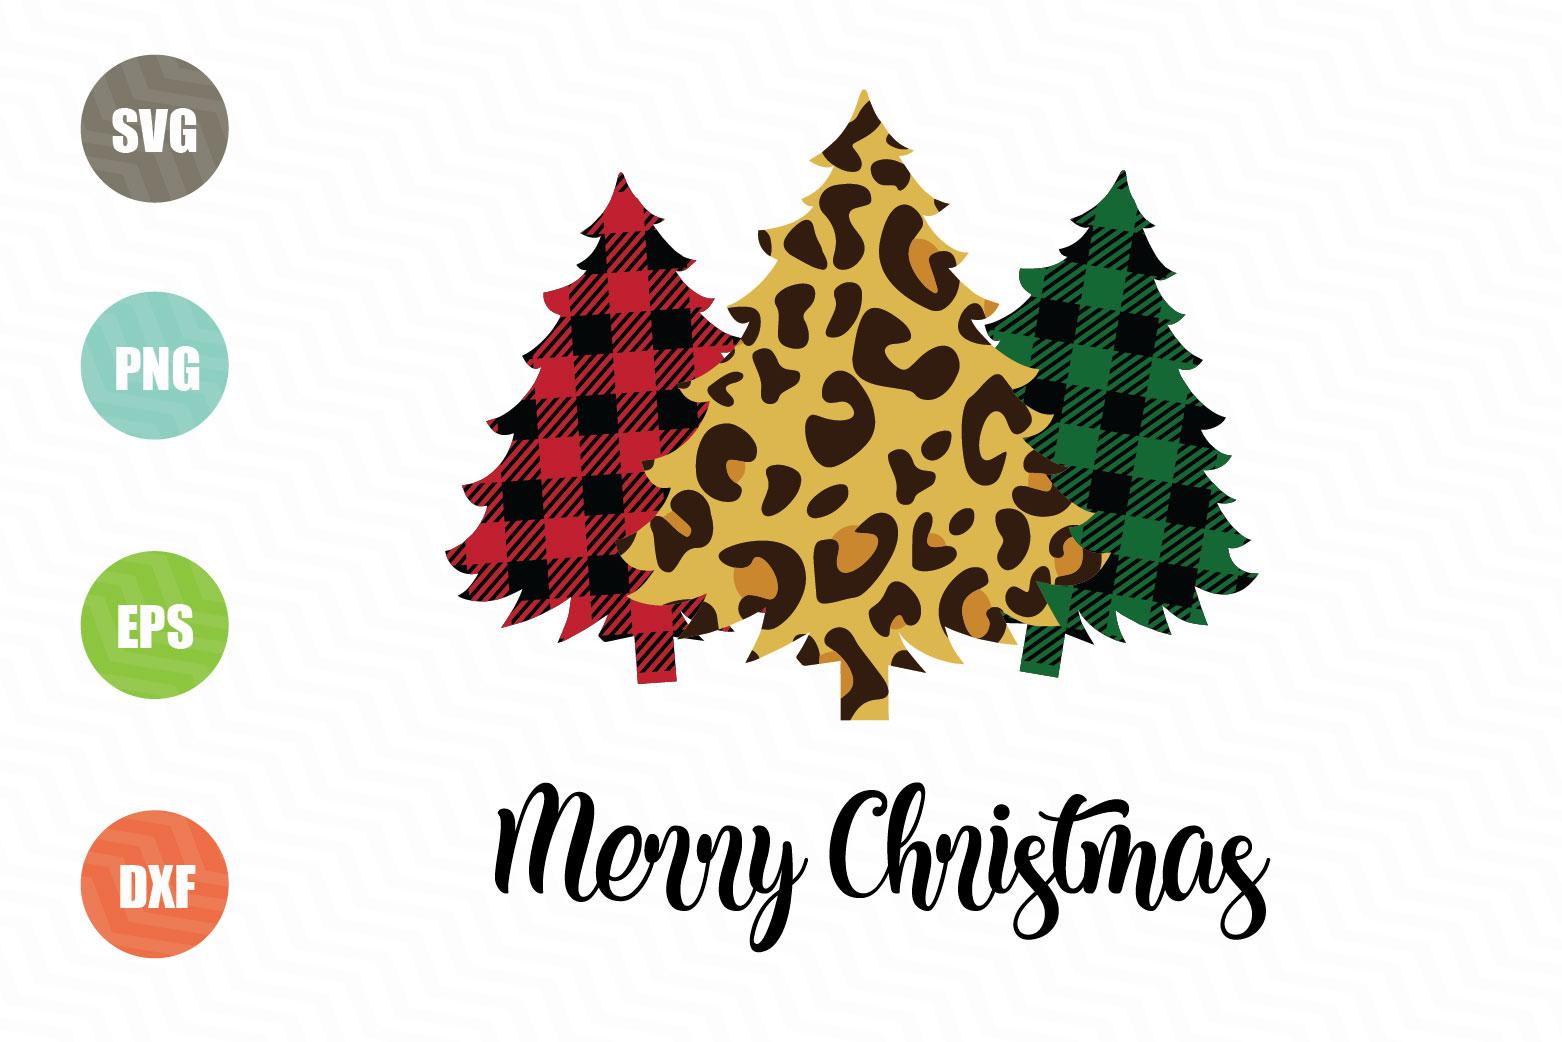 Merry Christmas SVG, Christmas Tree SVG example image 1